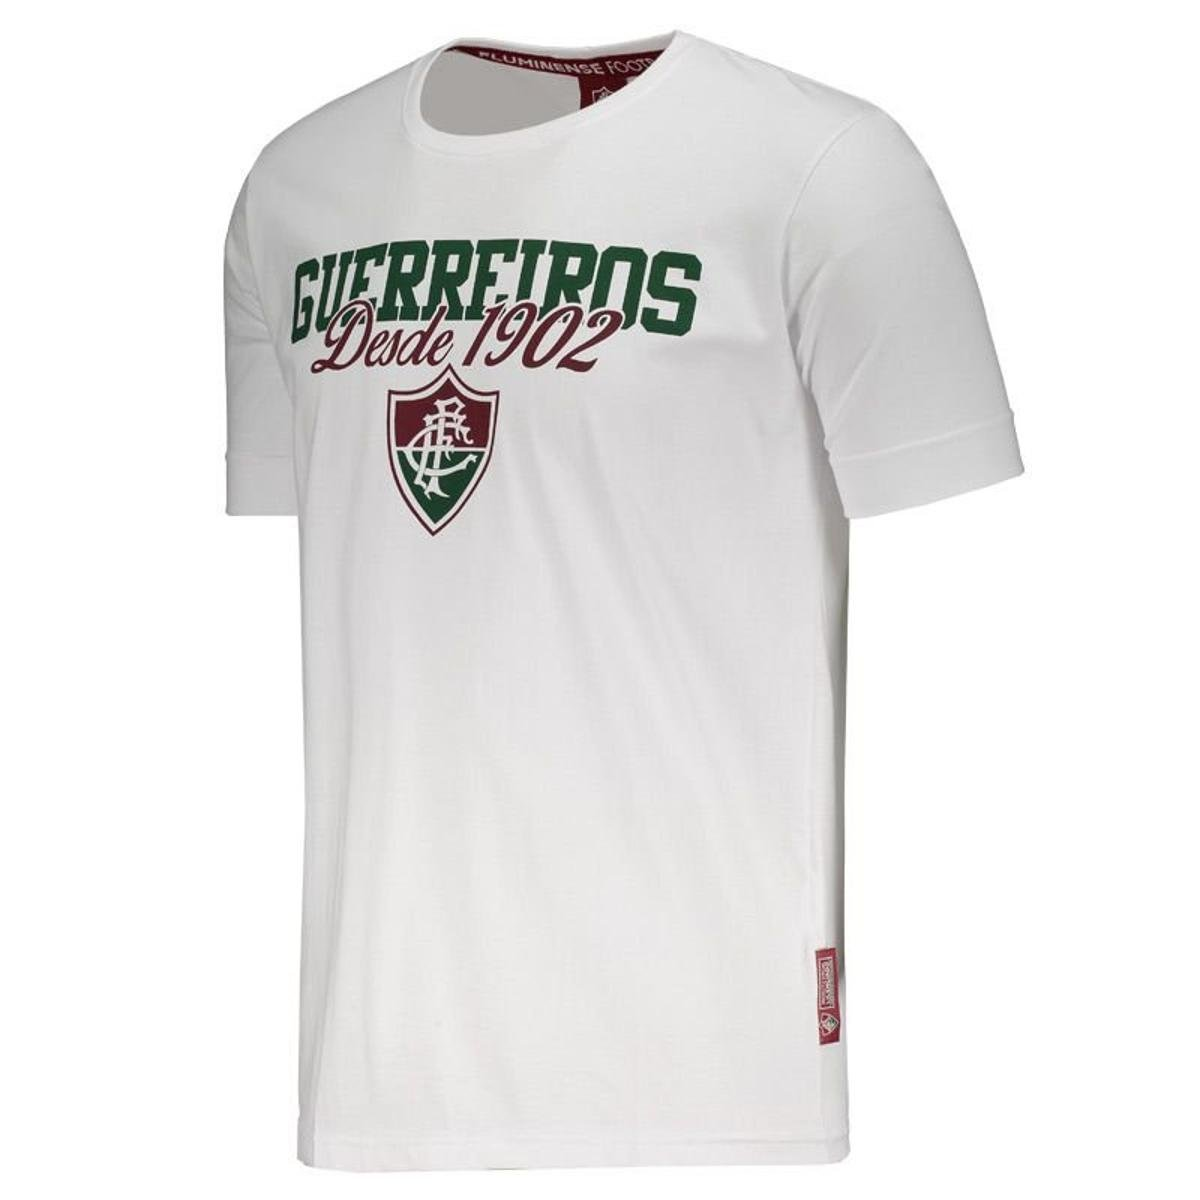 Camiseta Fluminense Guerreiros Masculina  Camiseta Fluminense Guerreiros  Masculina ... d8795de0fcc8c